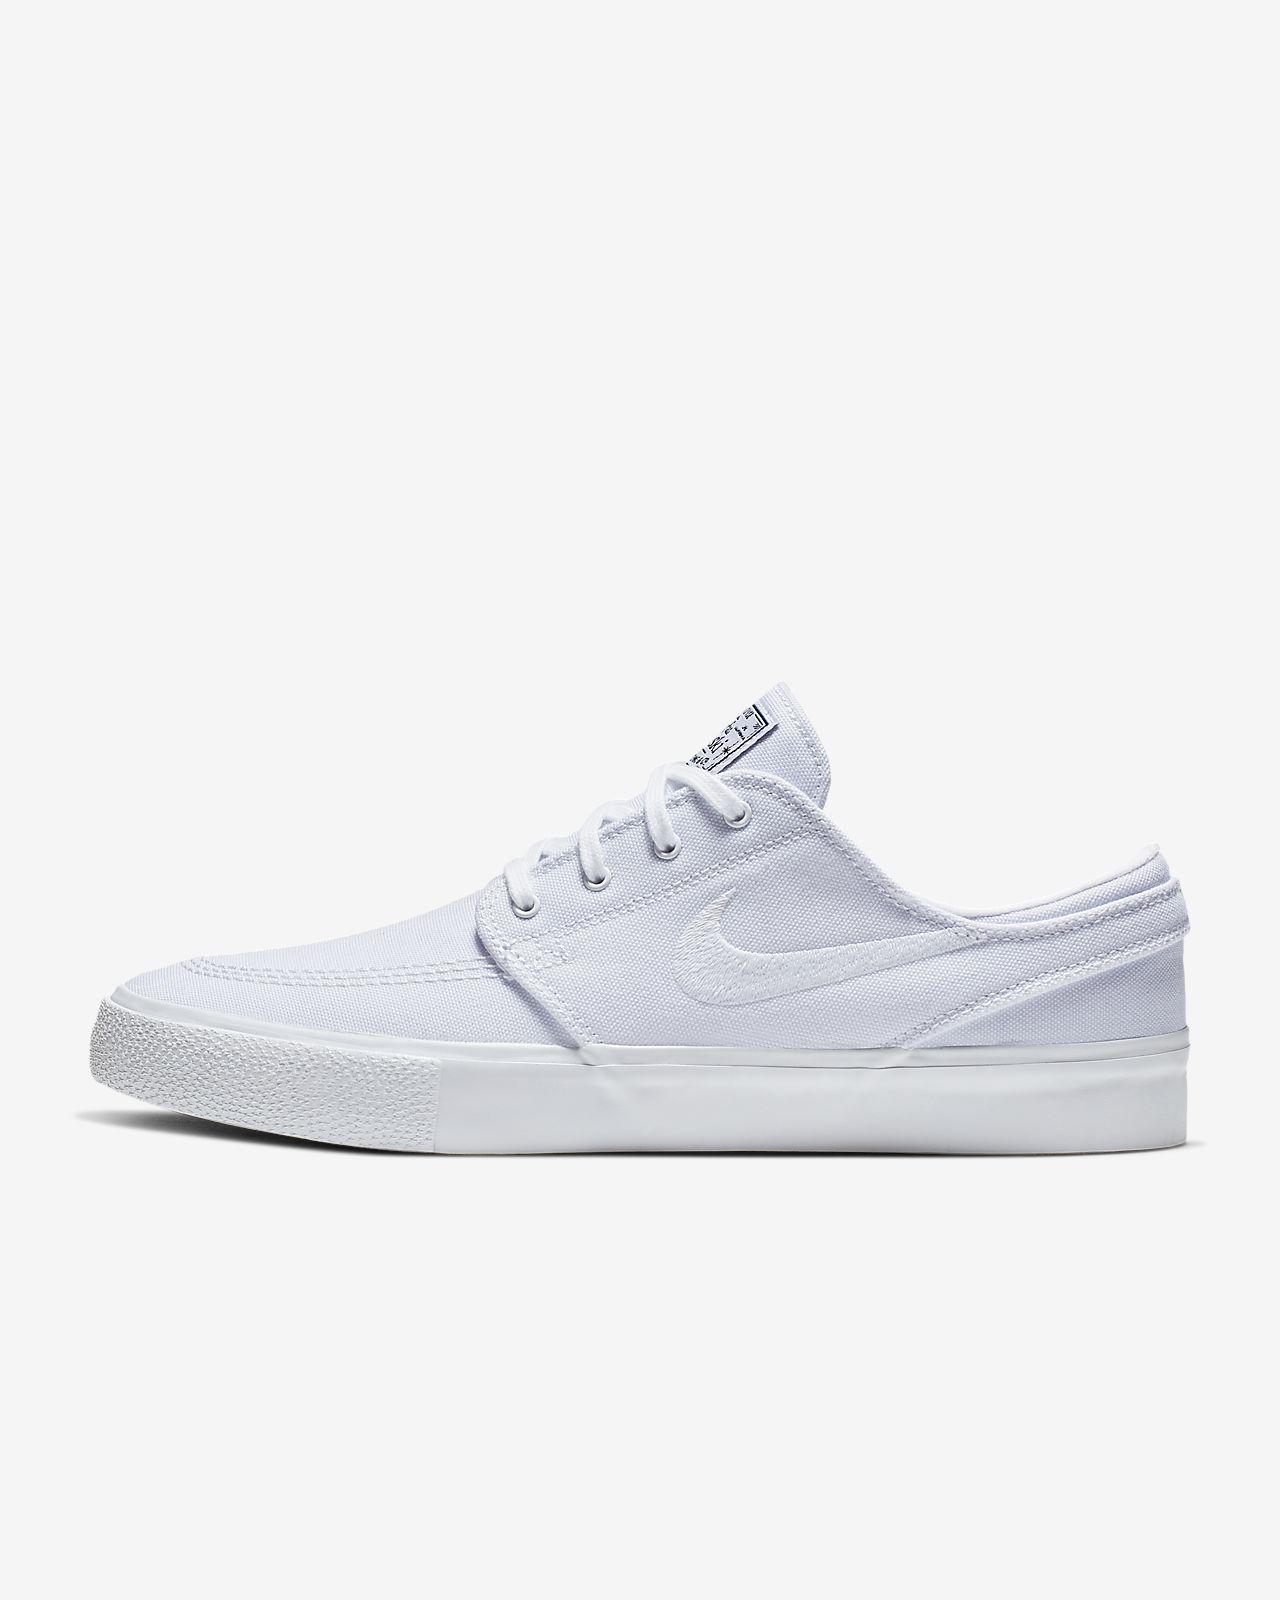 NIKE SB Zoom Stefan Janoski Canvas # Multi color White white